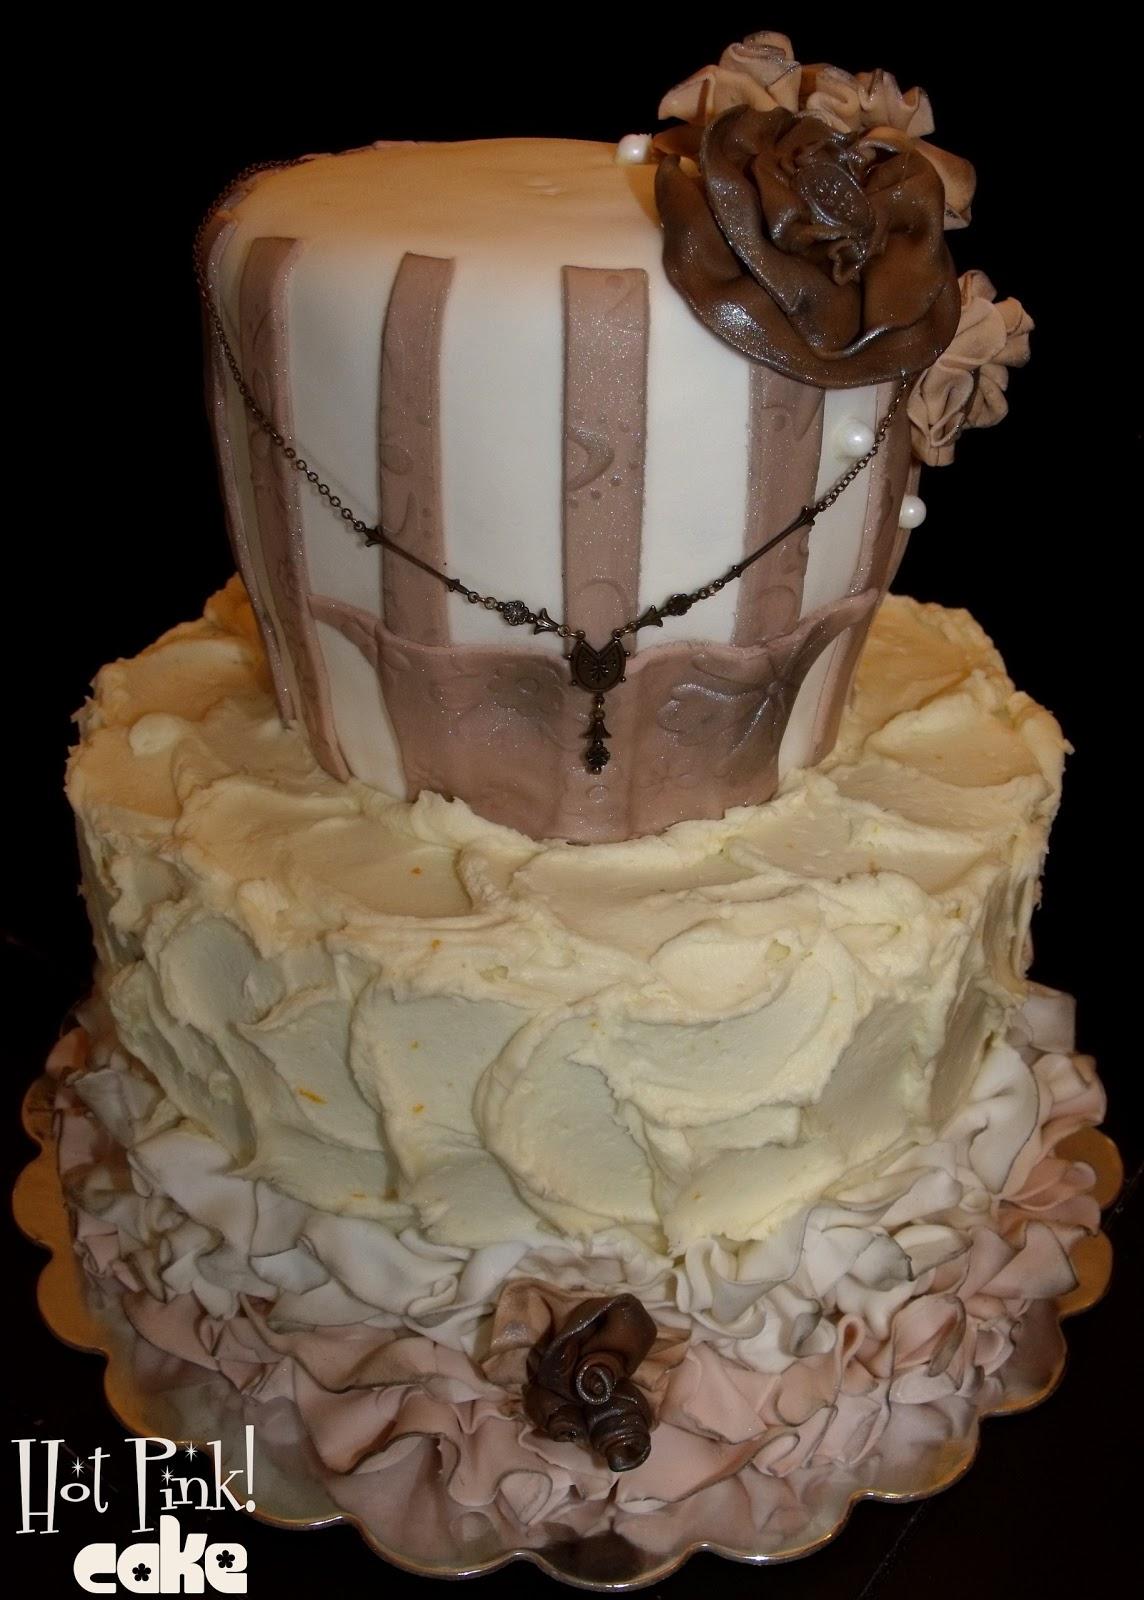 Hot Pink Cakes 100 Years Vintage Birthday Cake